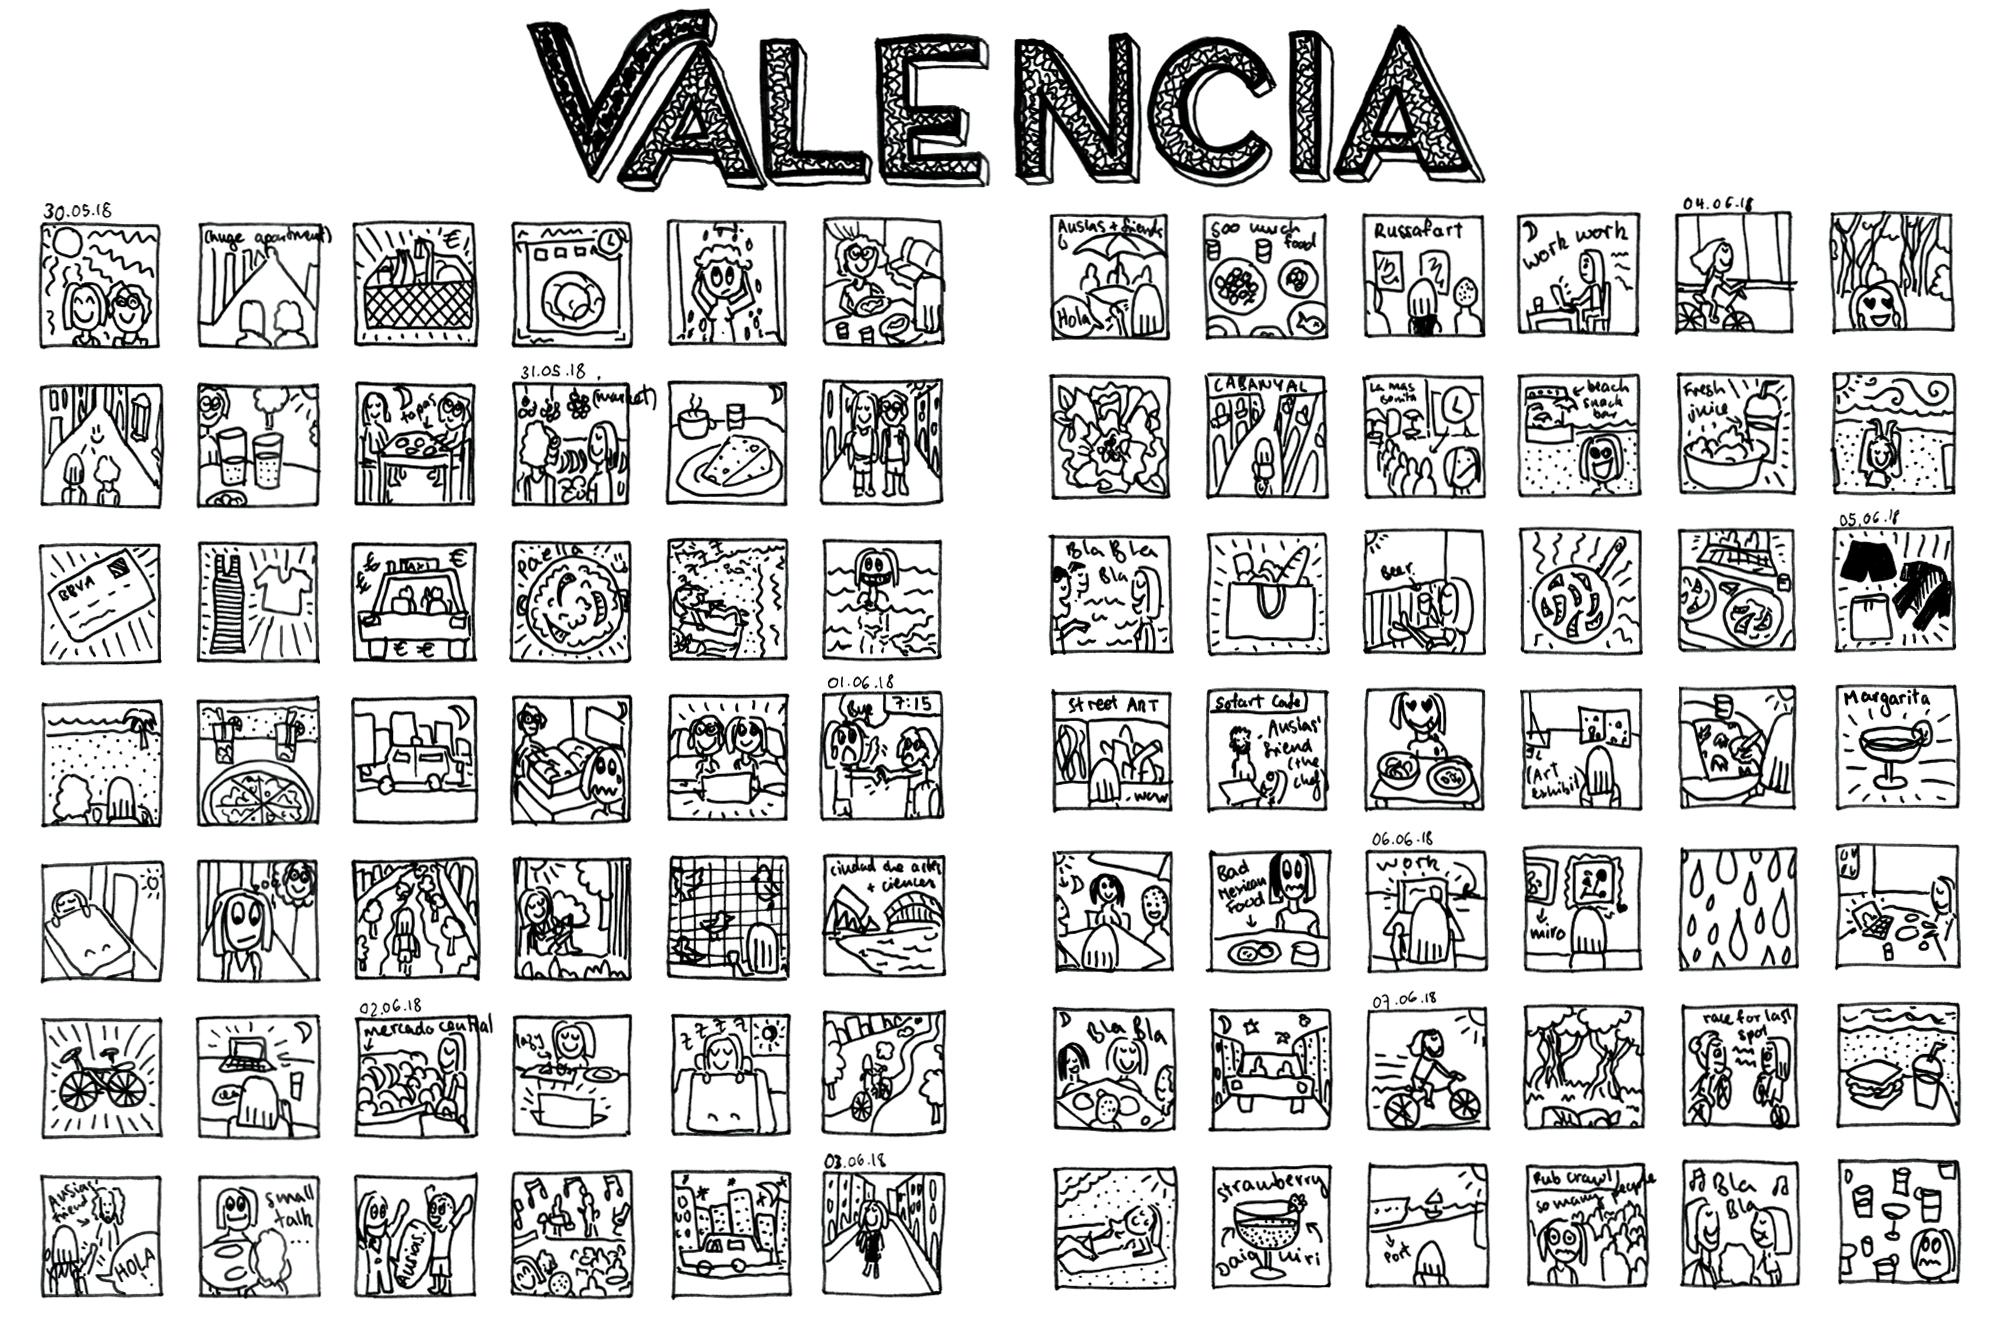 31_valencia_comic_web.jpg